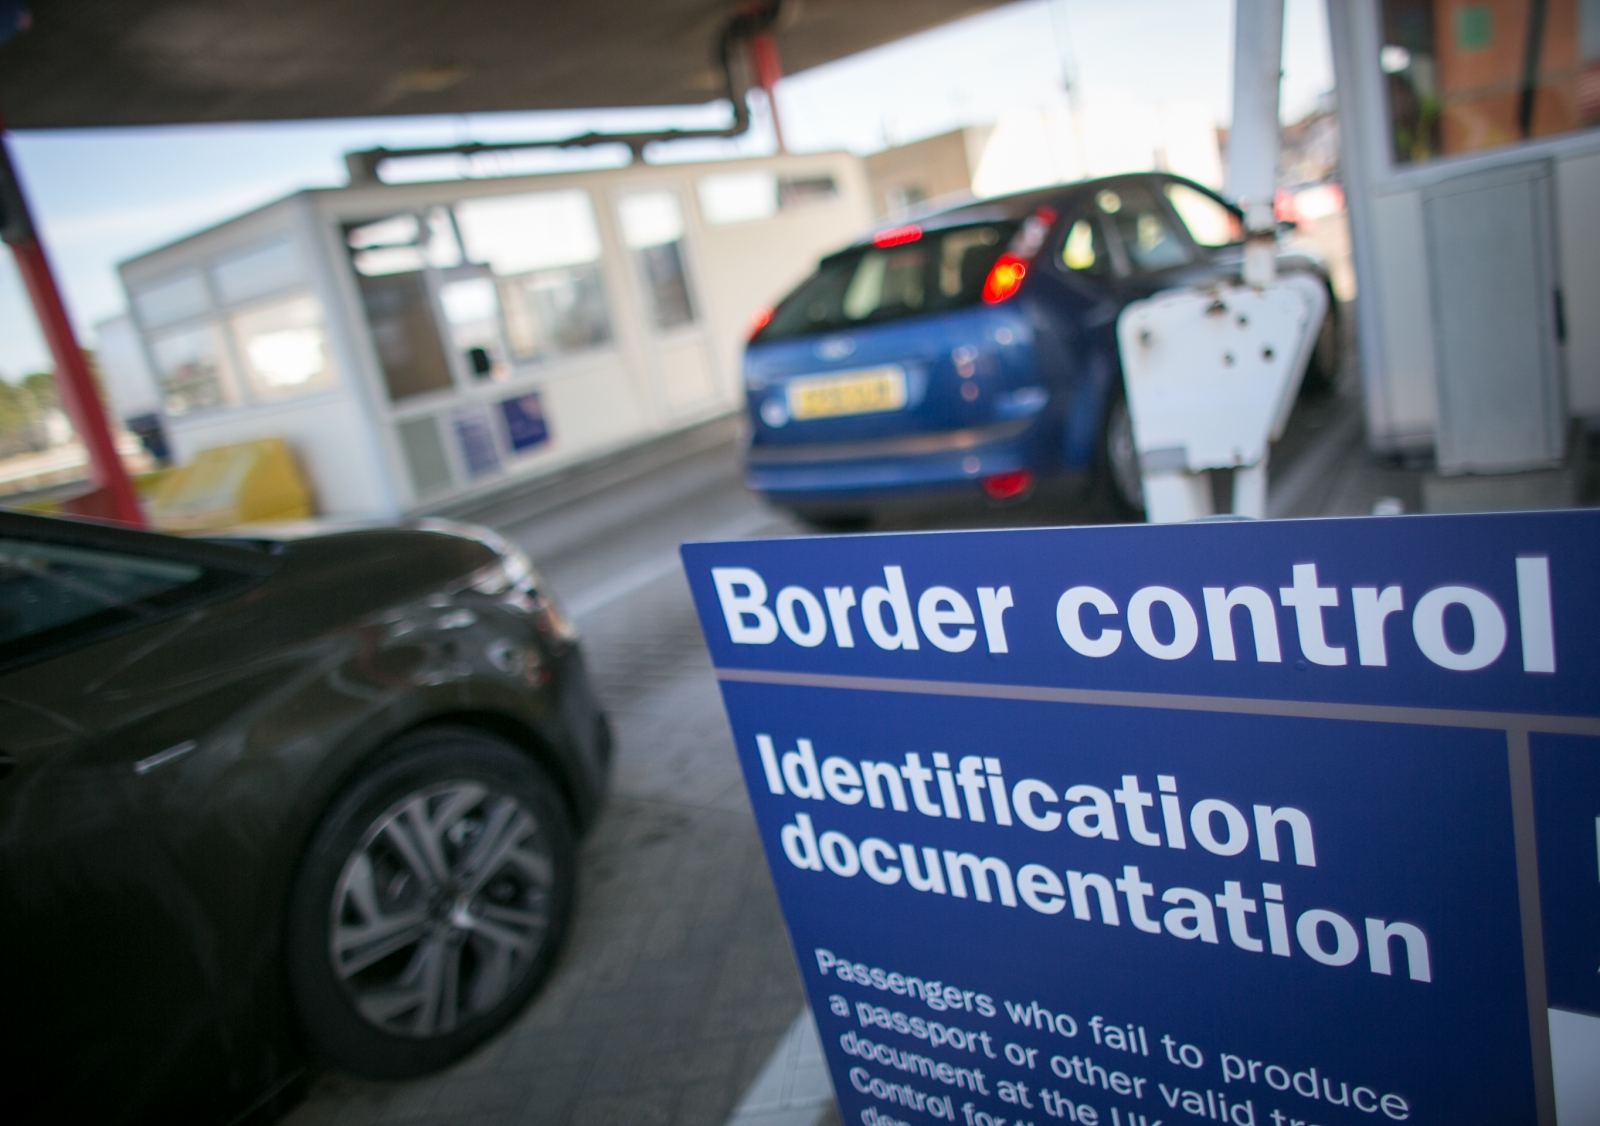 UK port border control